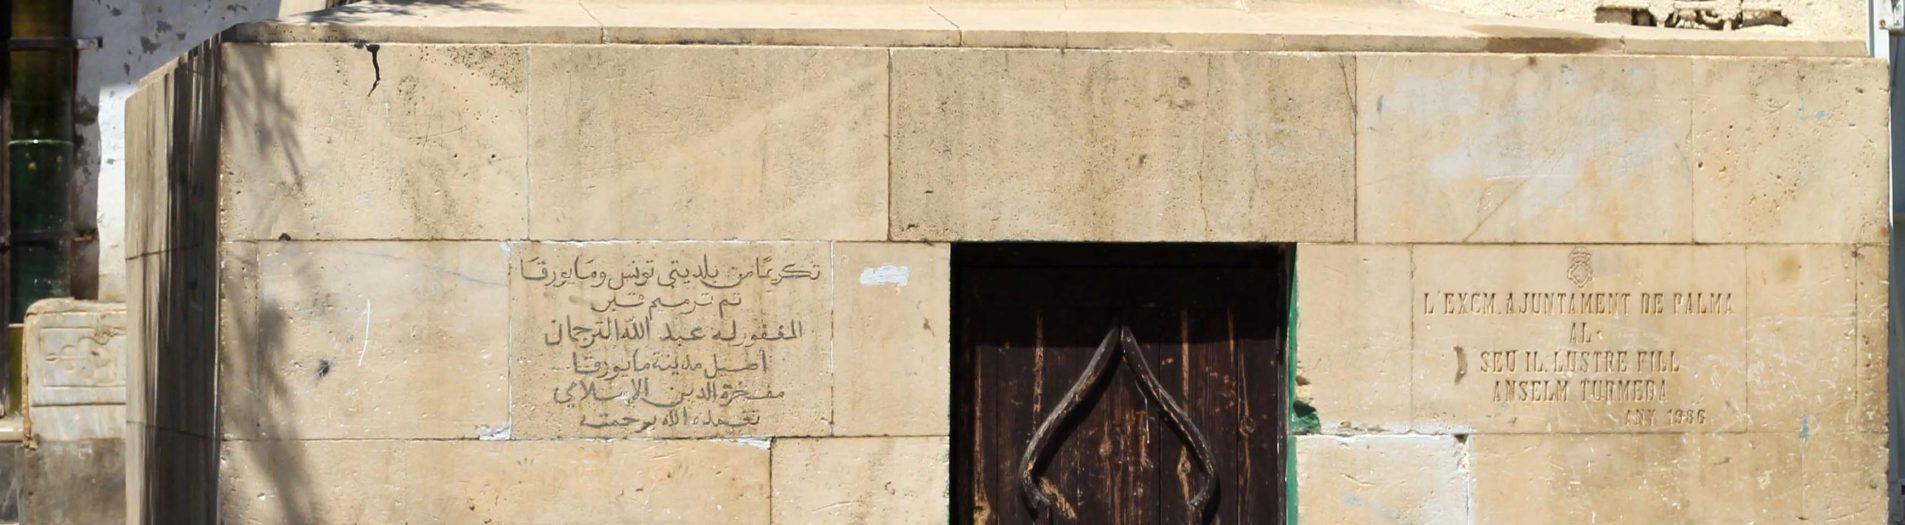 La coupole d'Abdallah at Turjuman